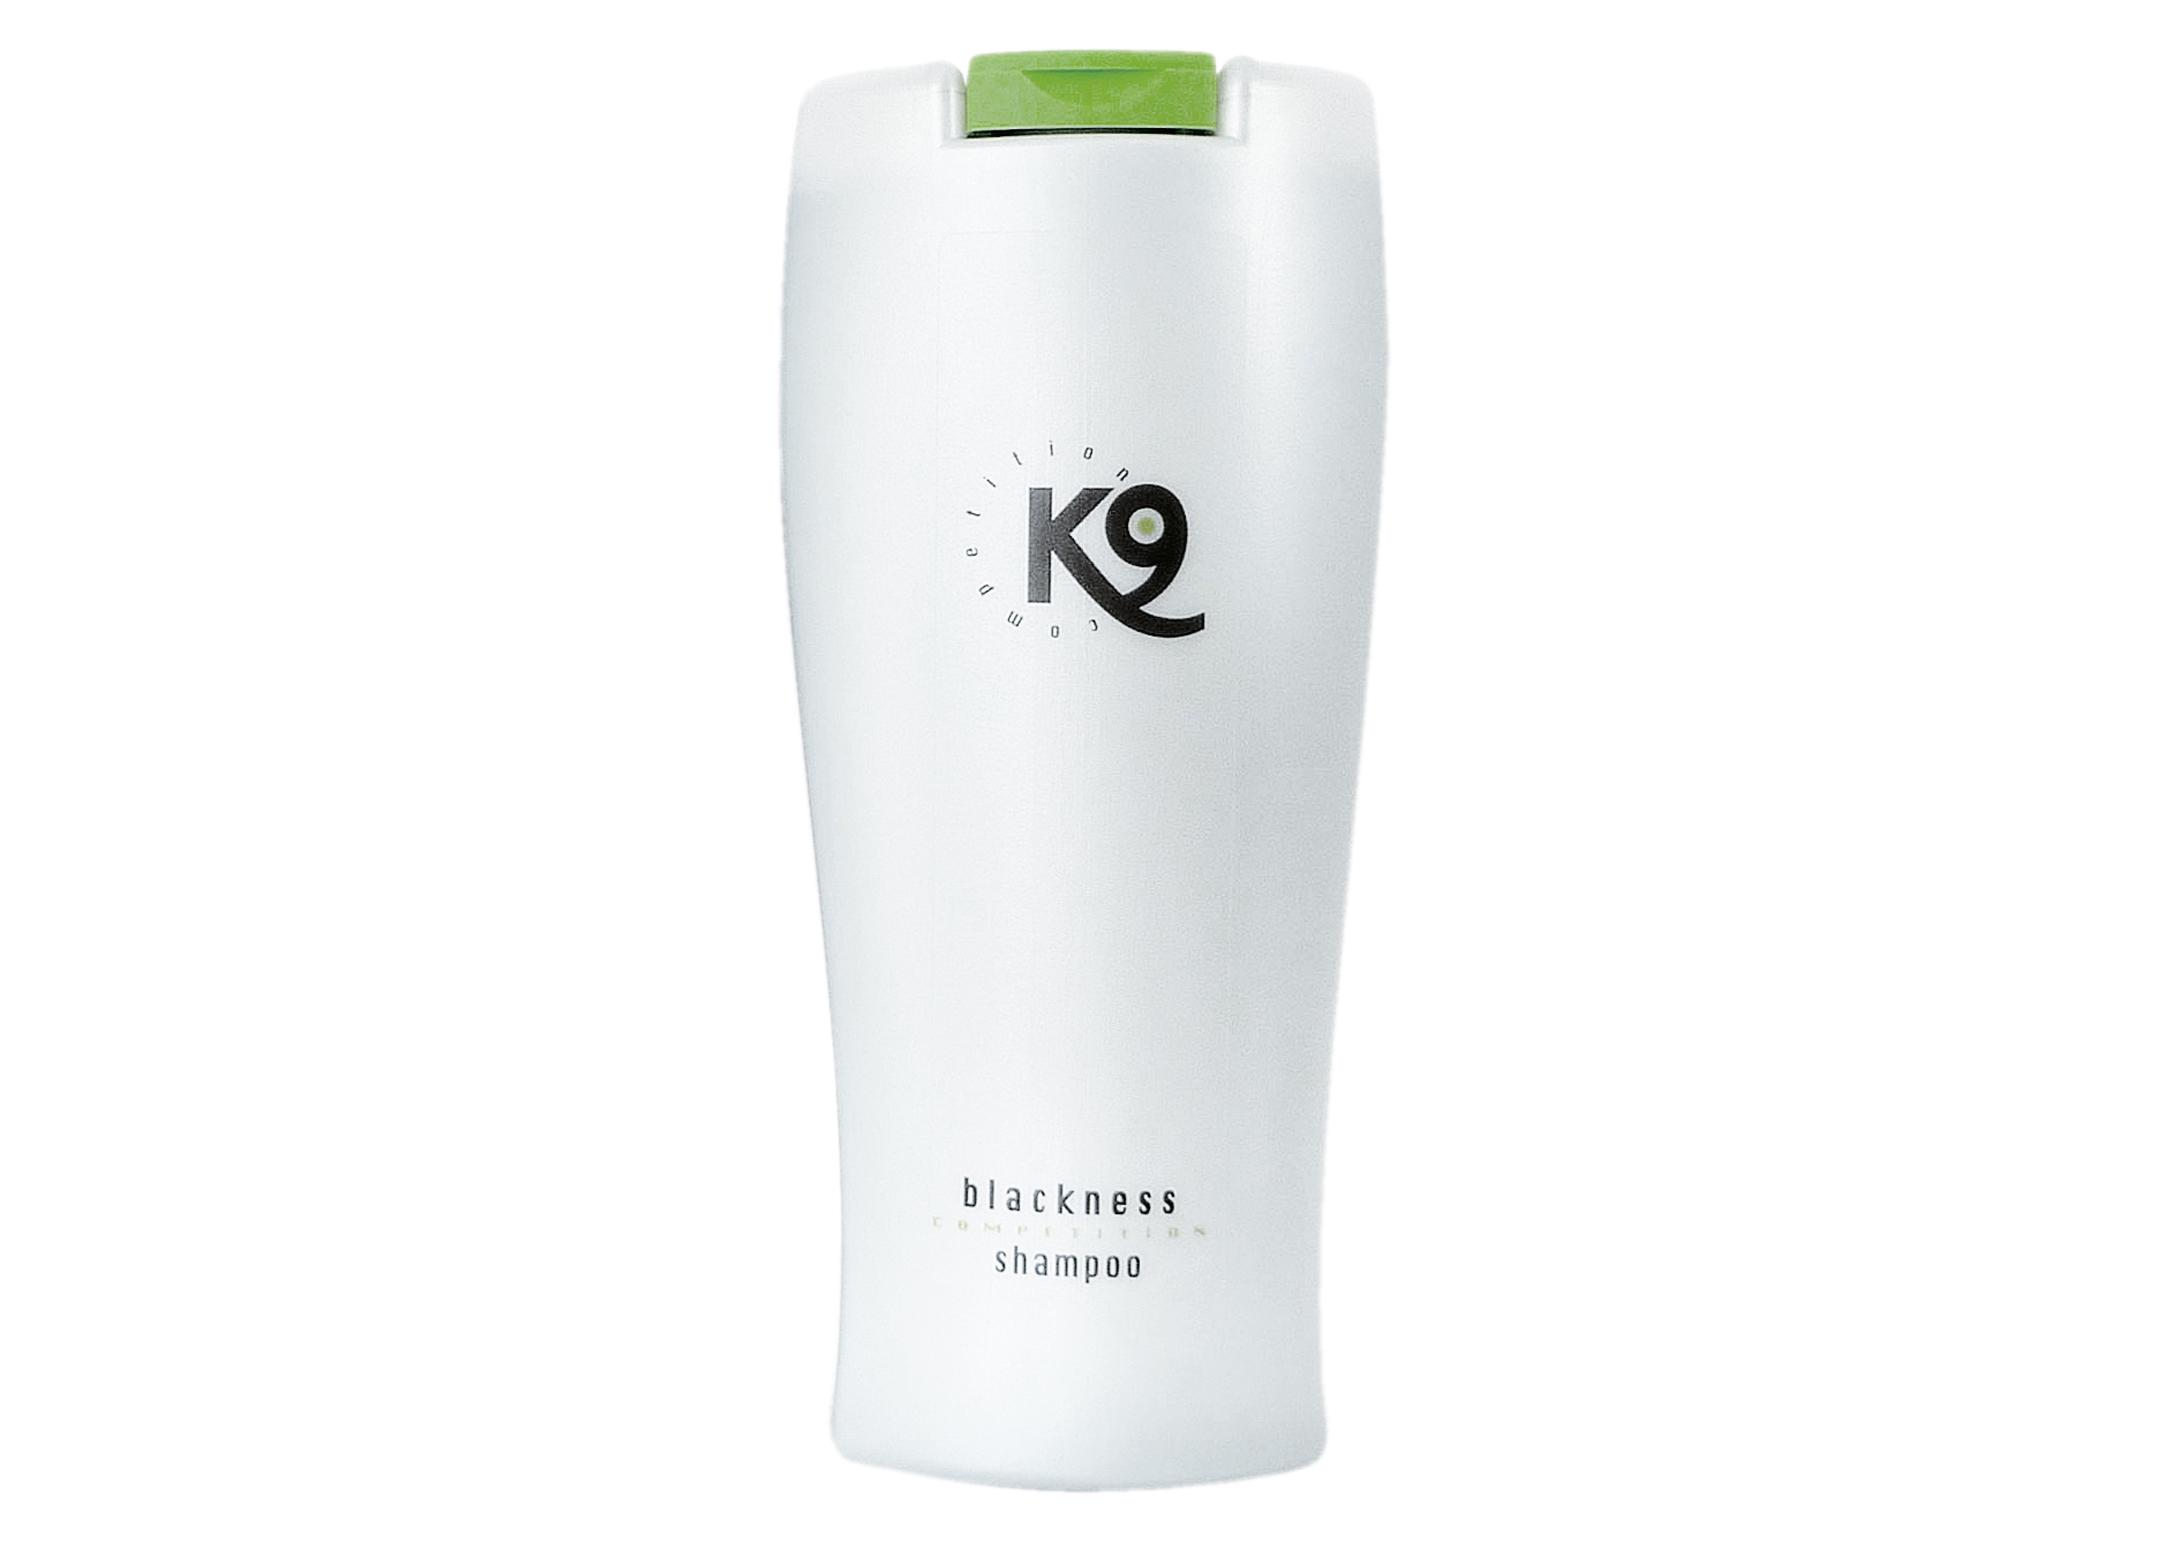 K9 Blackness Shampooing Pour Chiens et Chats